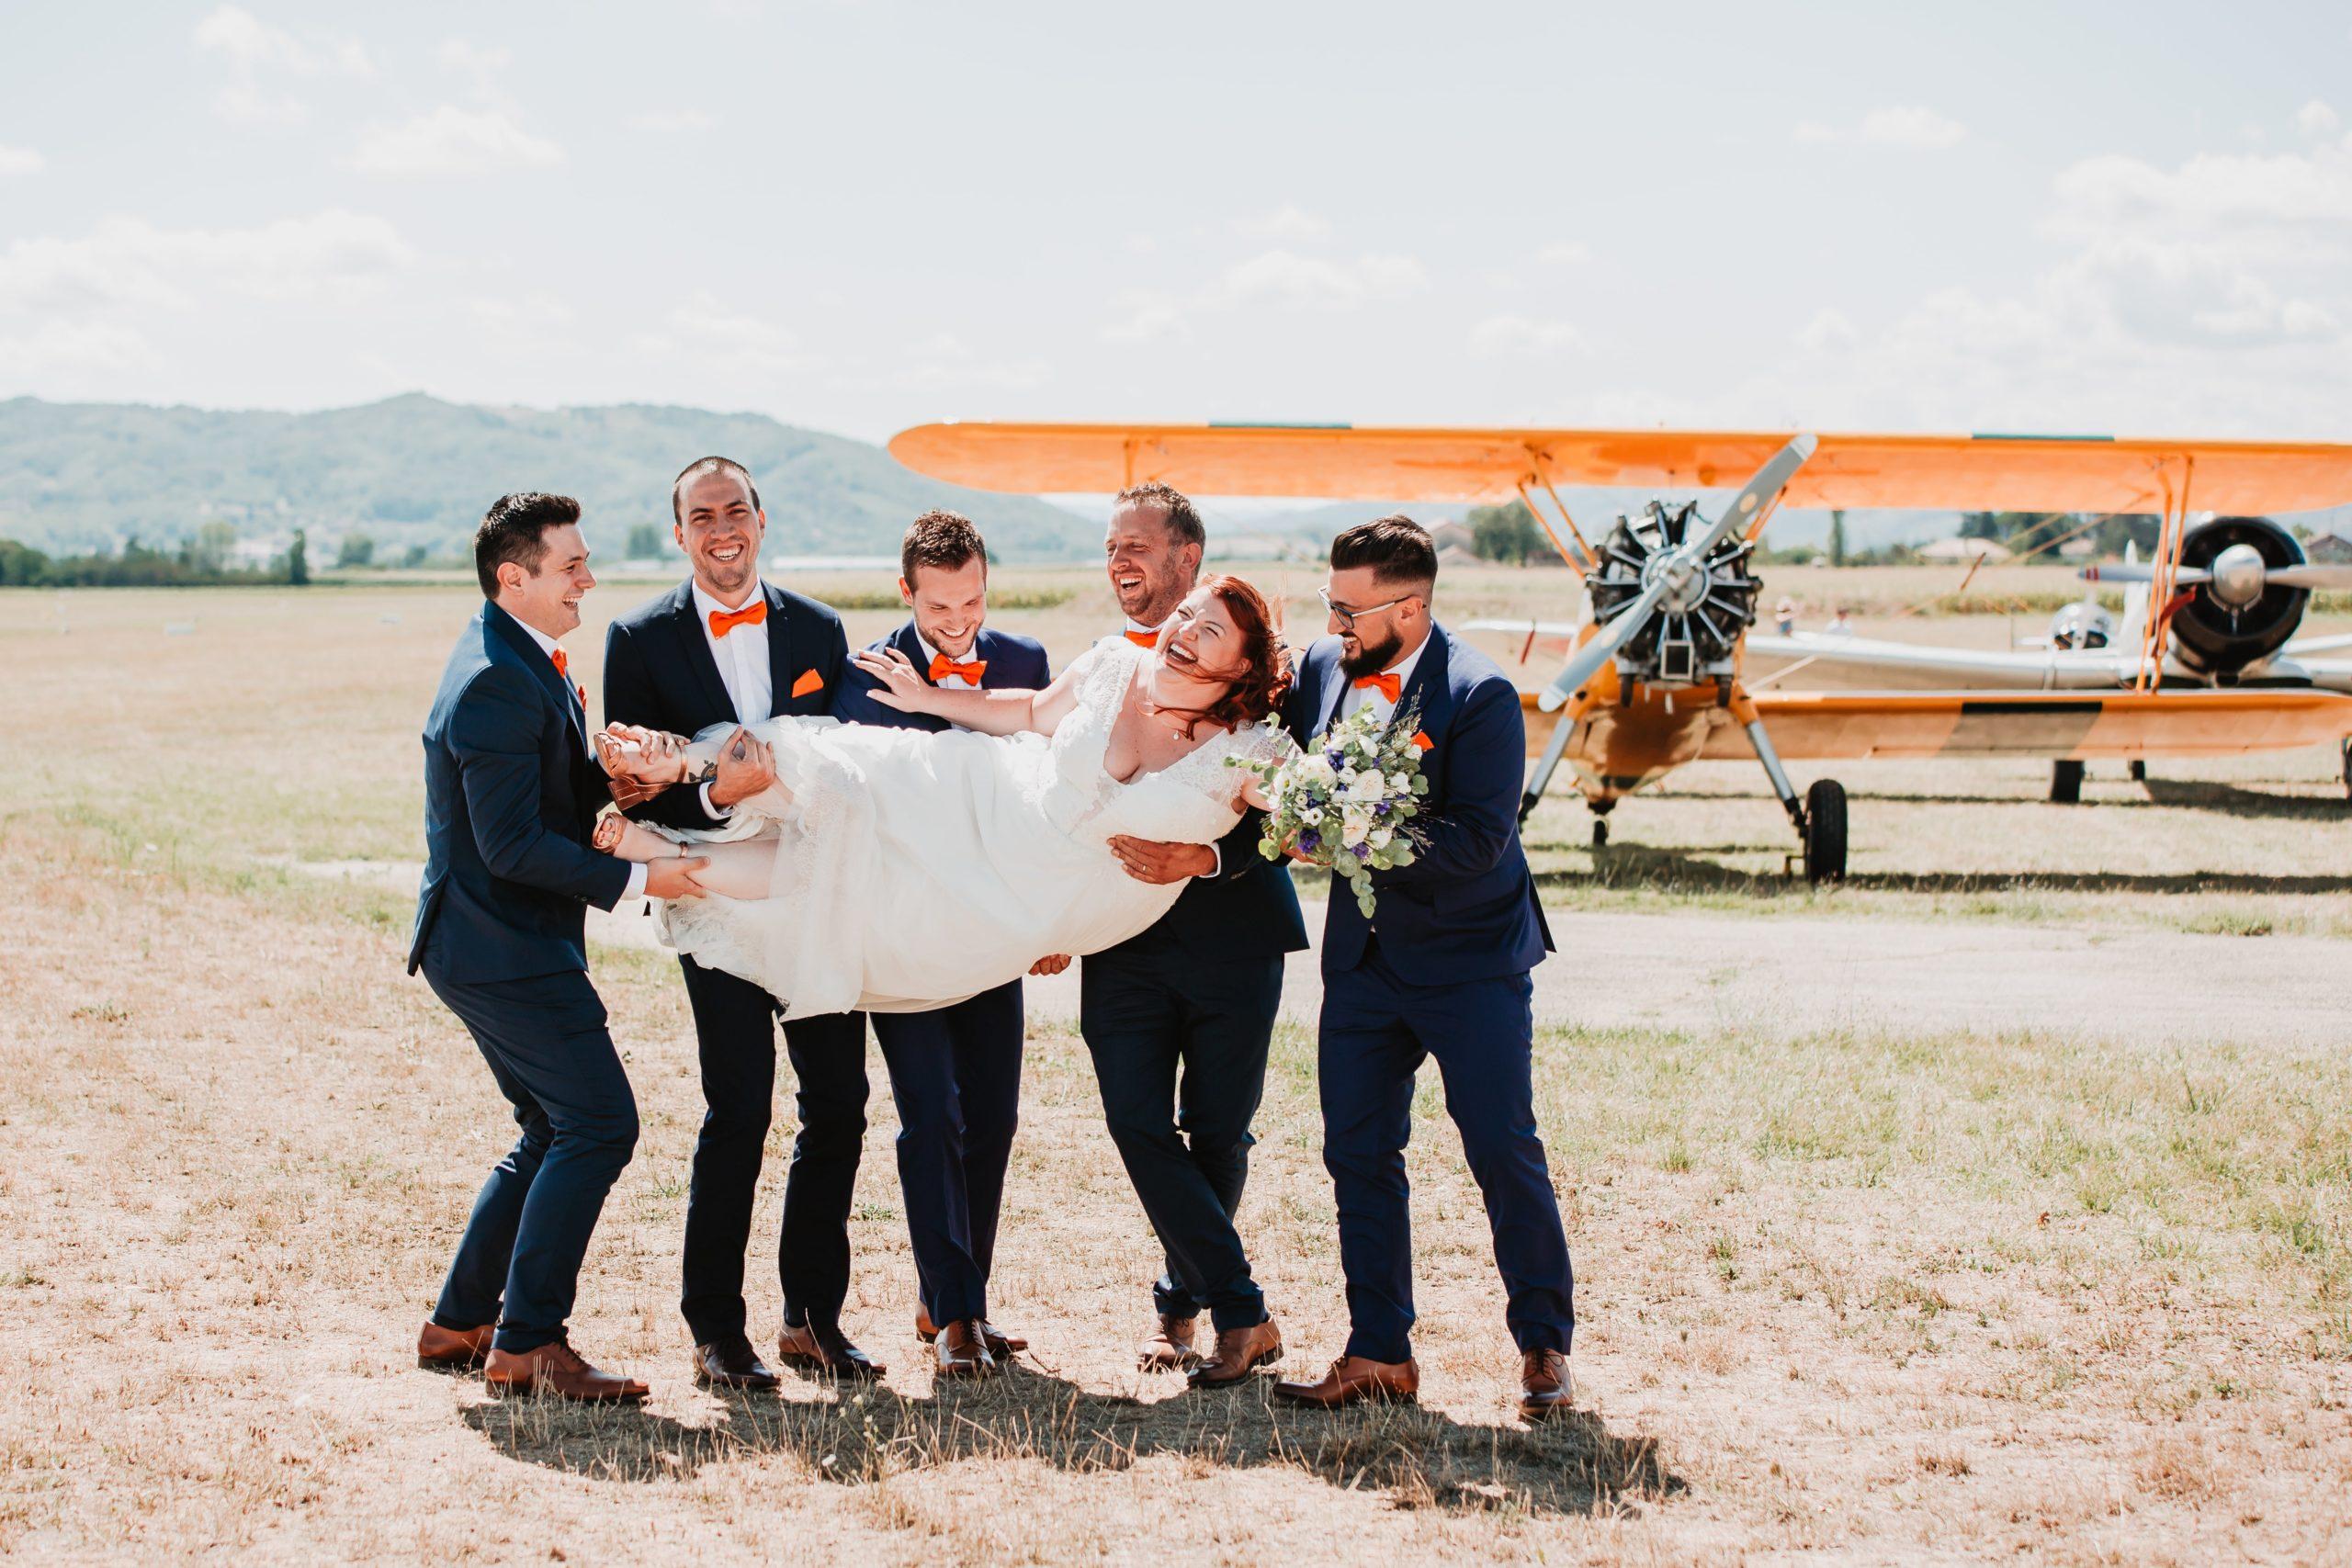 mariage témoins avions